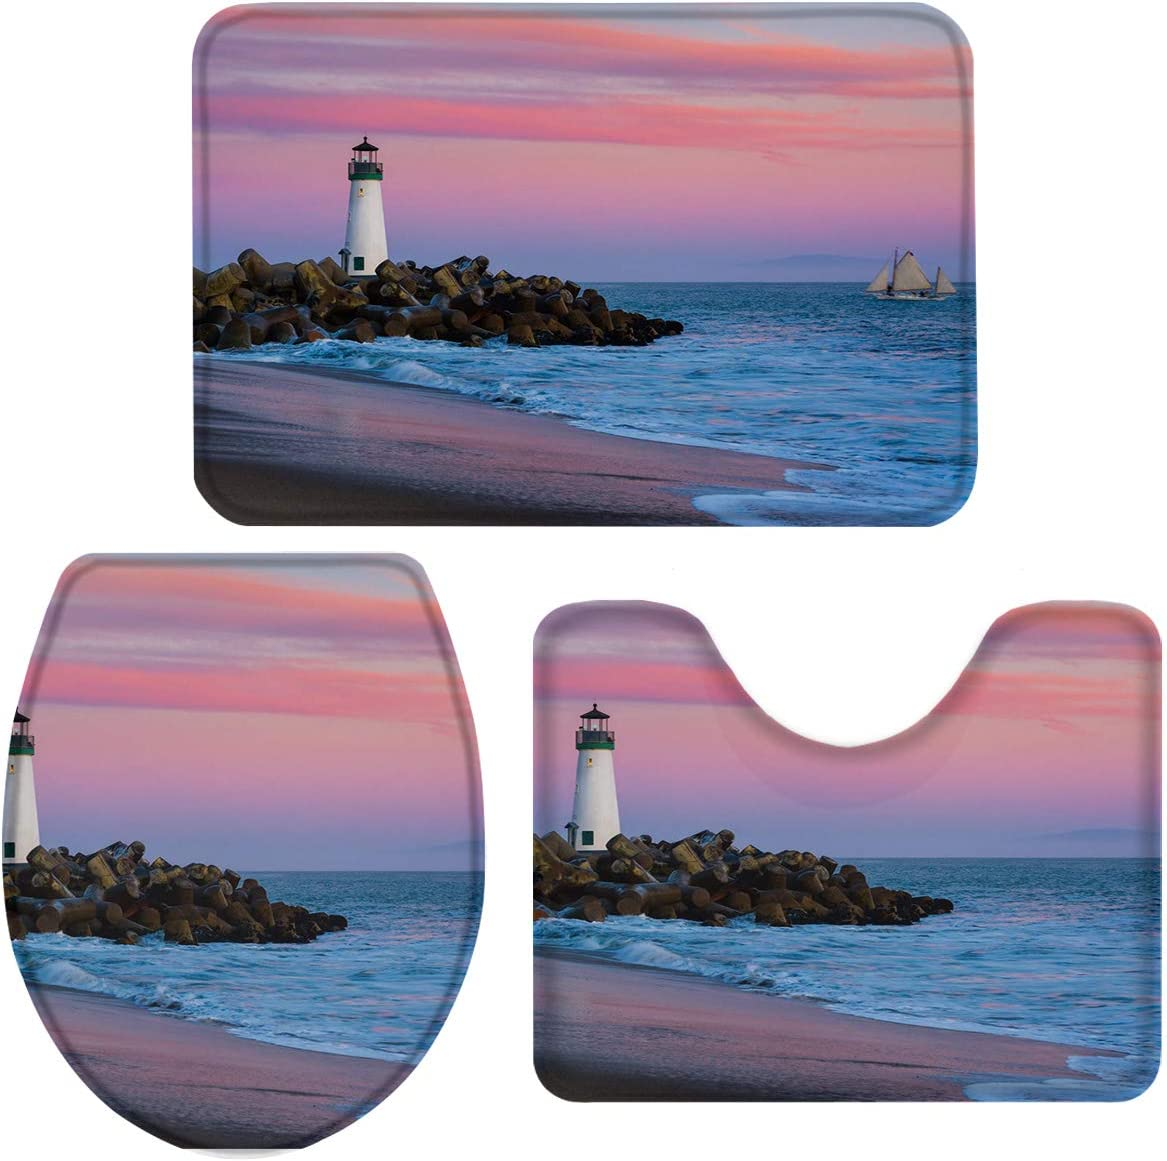 Vandarllin Beach Sunset Lighthouse Sailboat Bathro Plush Fashionable 3 Piece Mesa Mall